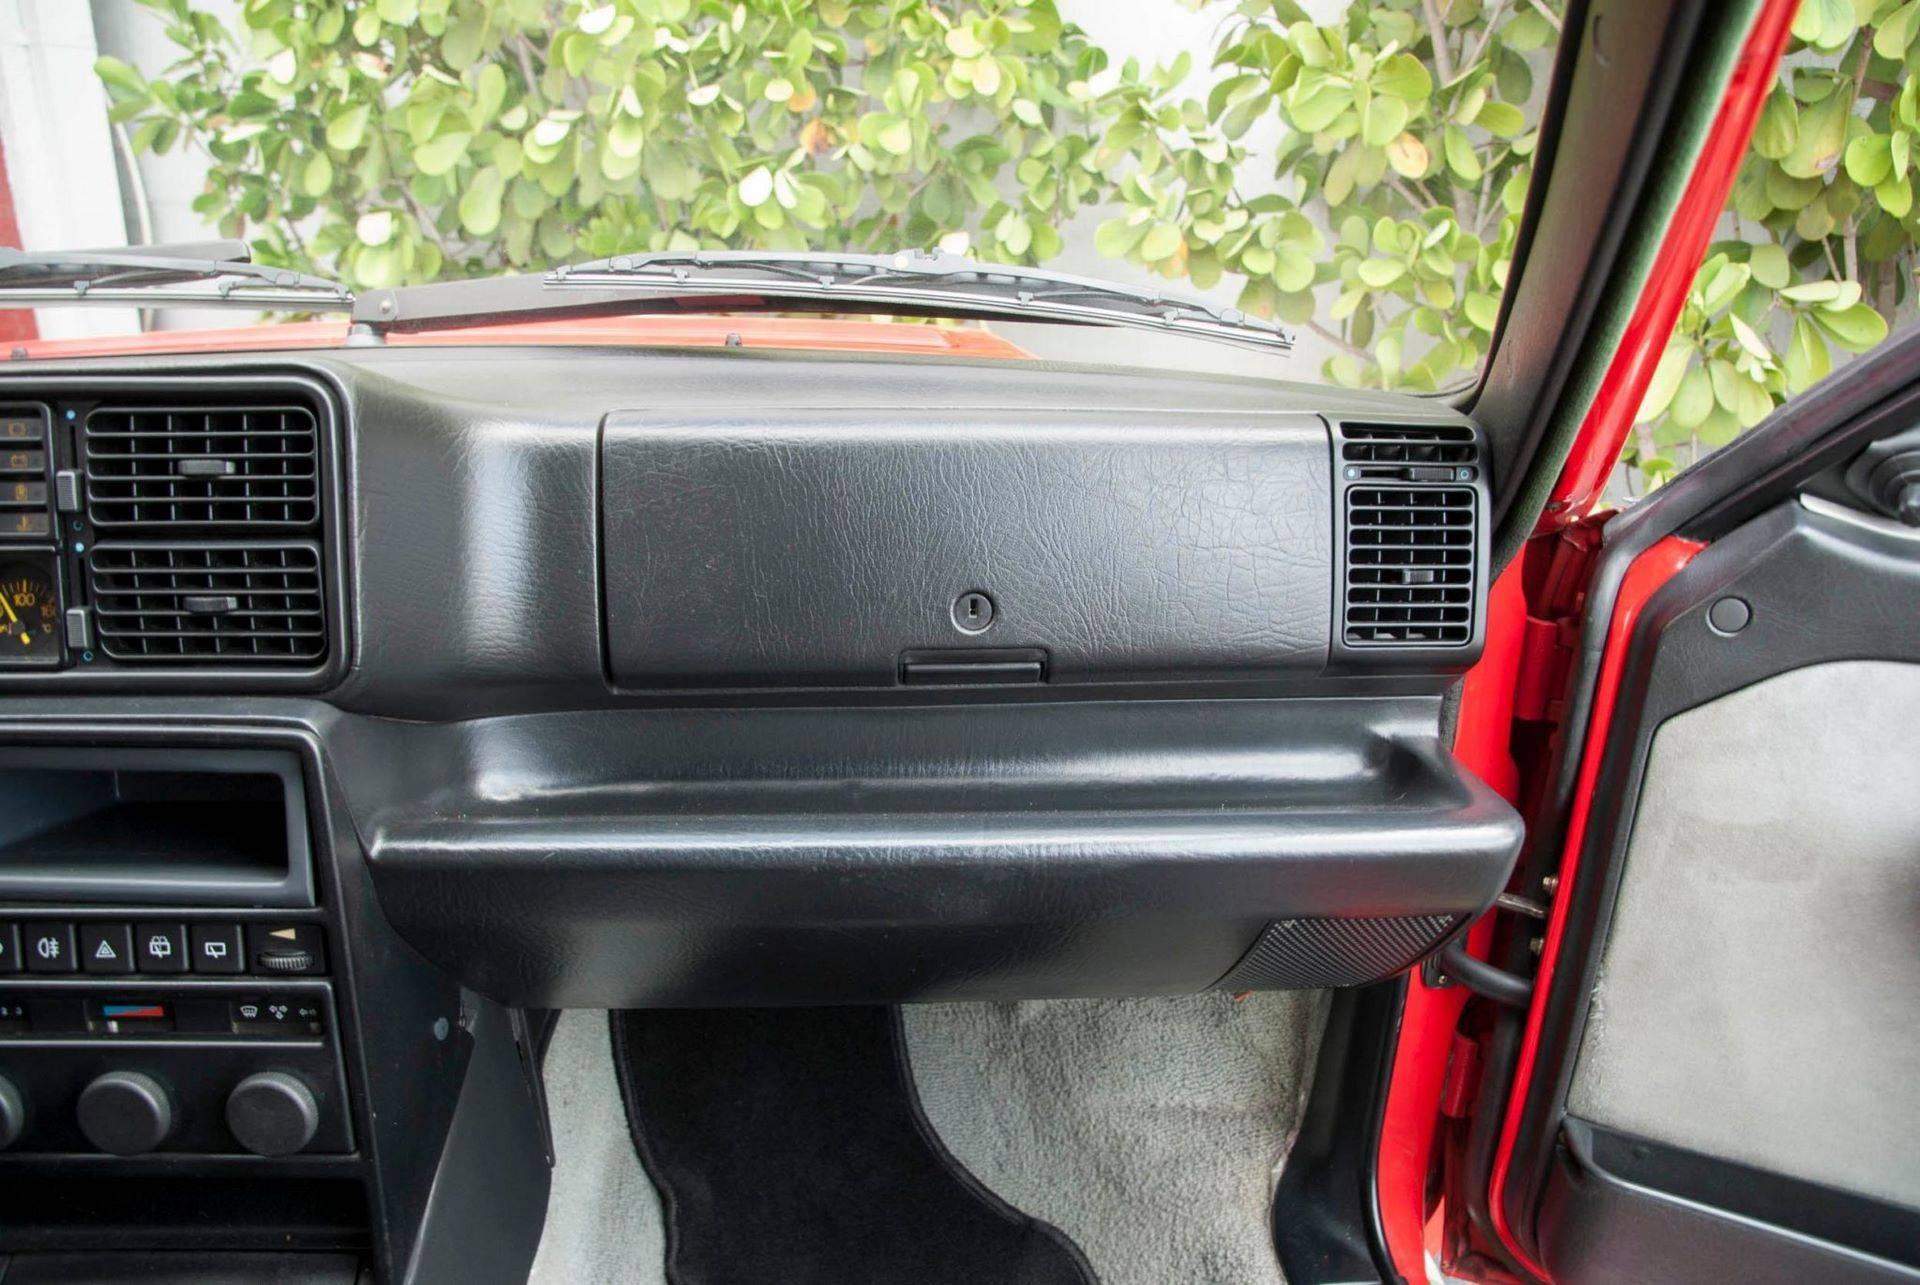 Lancia-Delta-Integrale-8V-1989-18